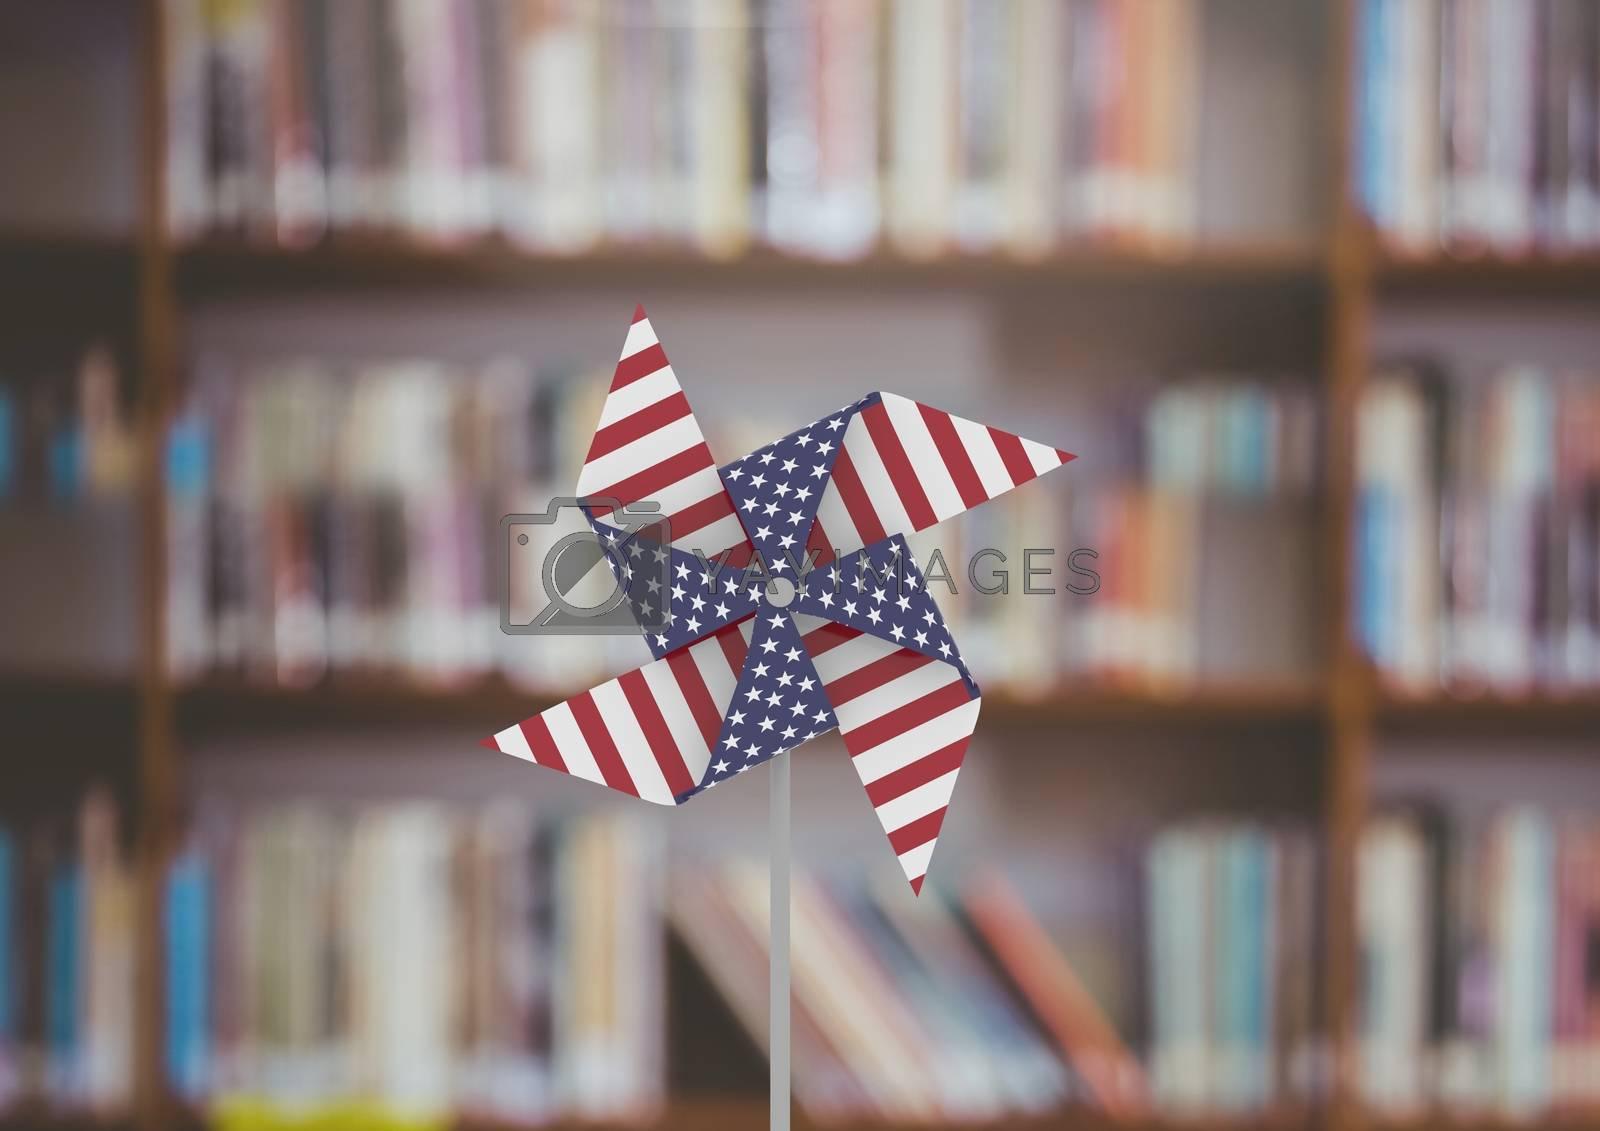 USA wind catcher in front of bookshelf by Wavebreakmedia